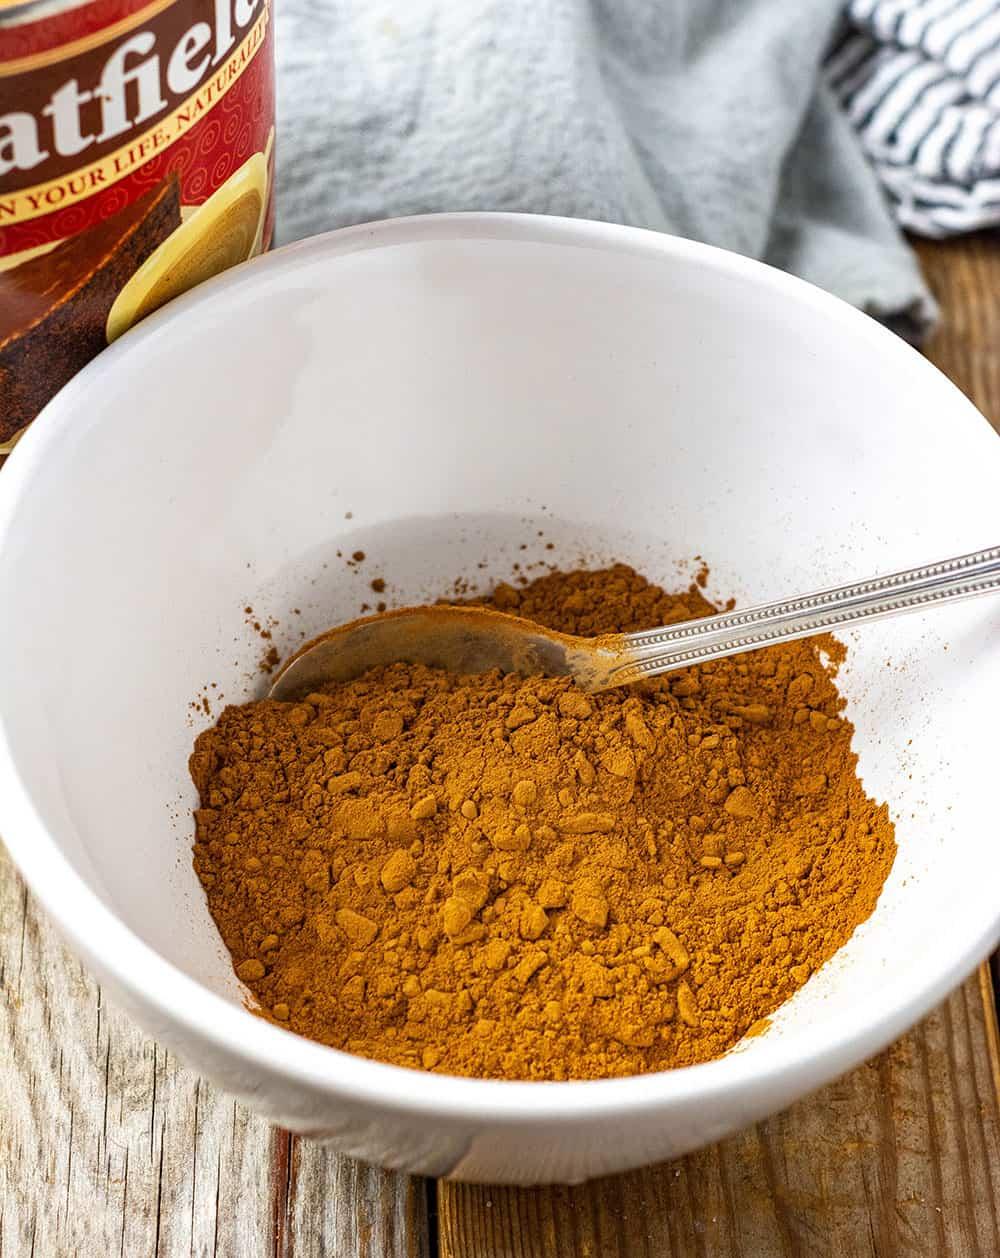 Carob Powder For Carob Energy Bites